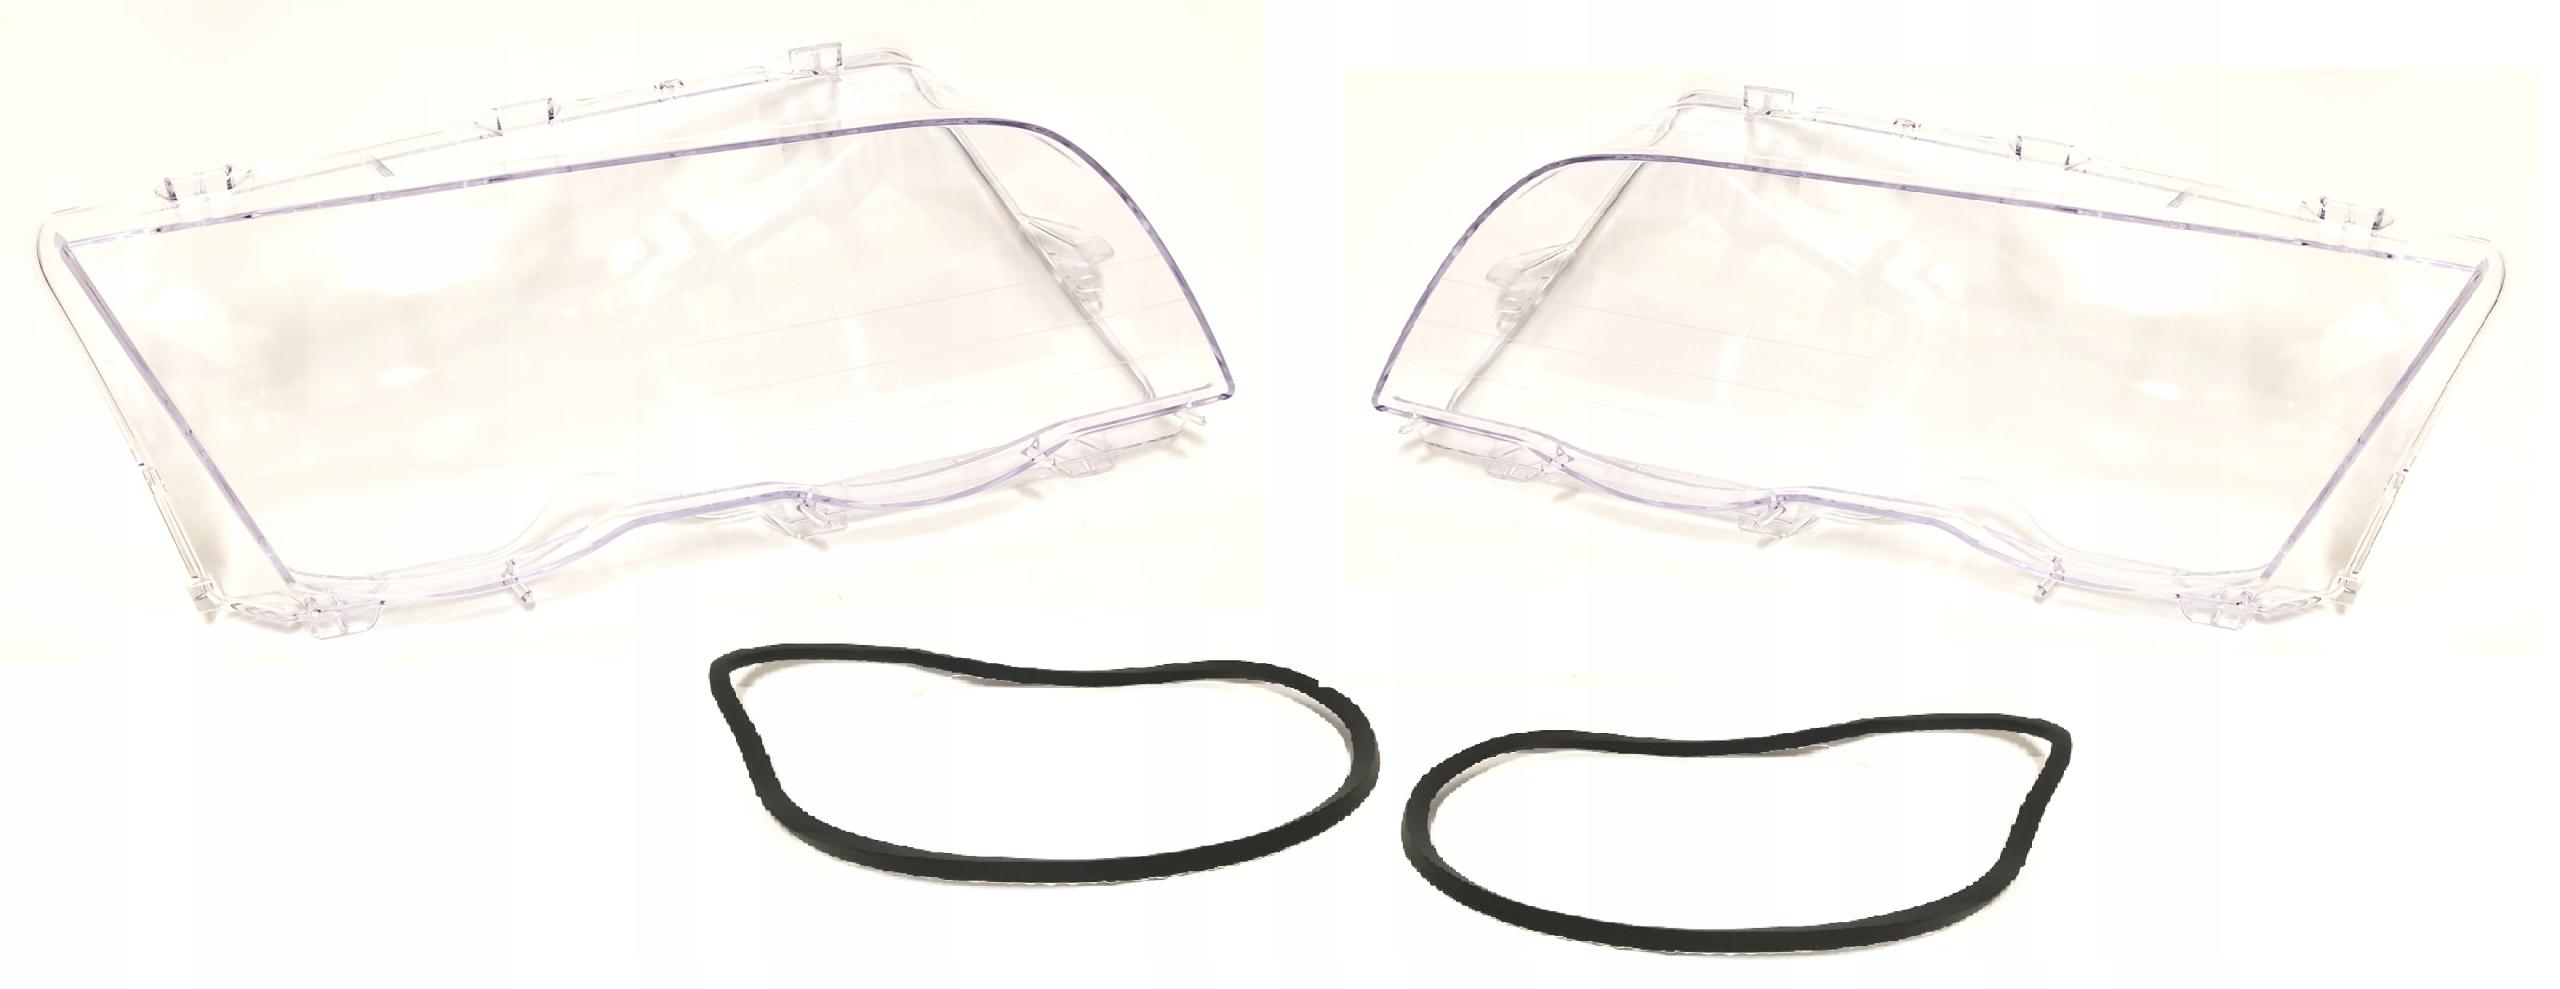 bmw 3 e46 98-01 седан универсал новые абажуры стекла компл